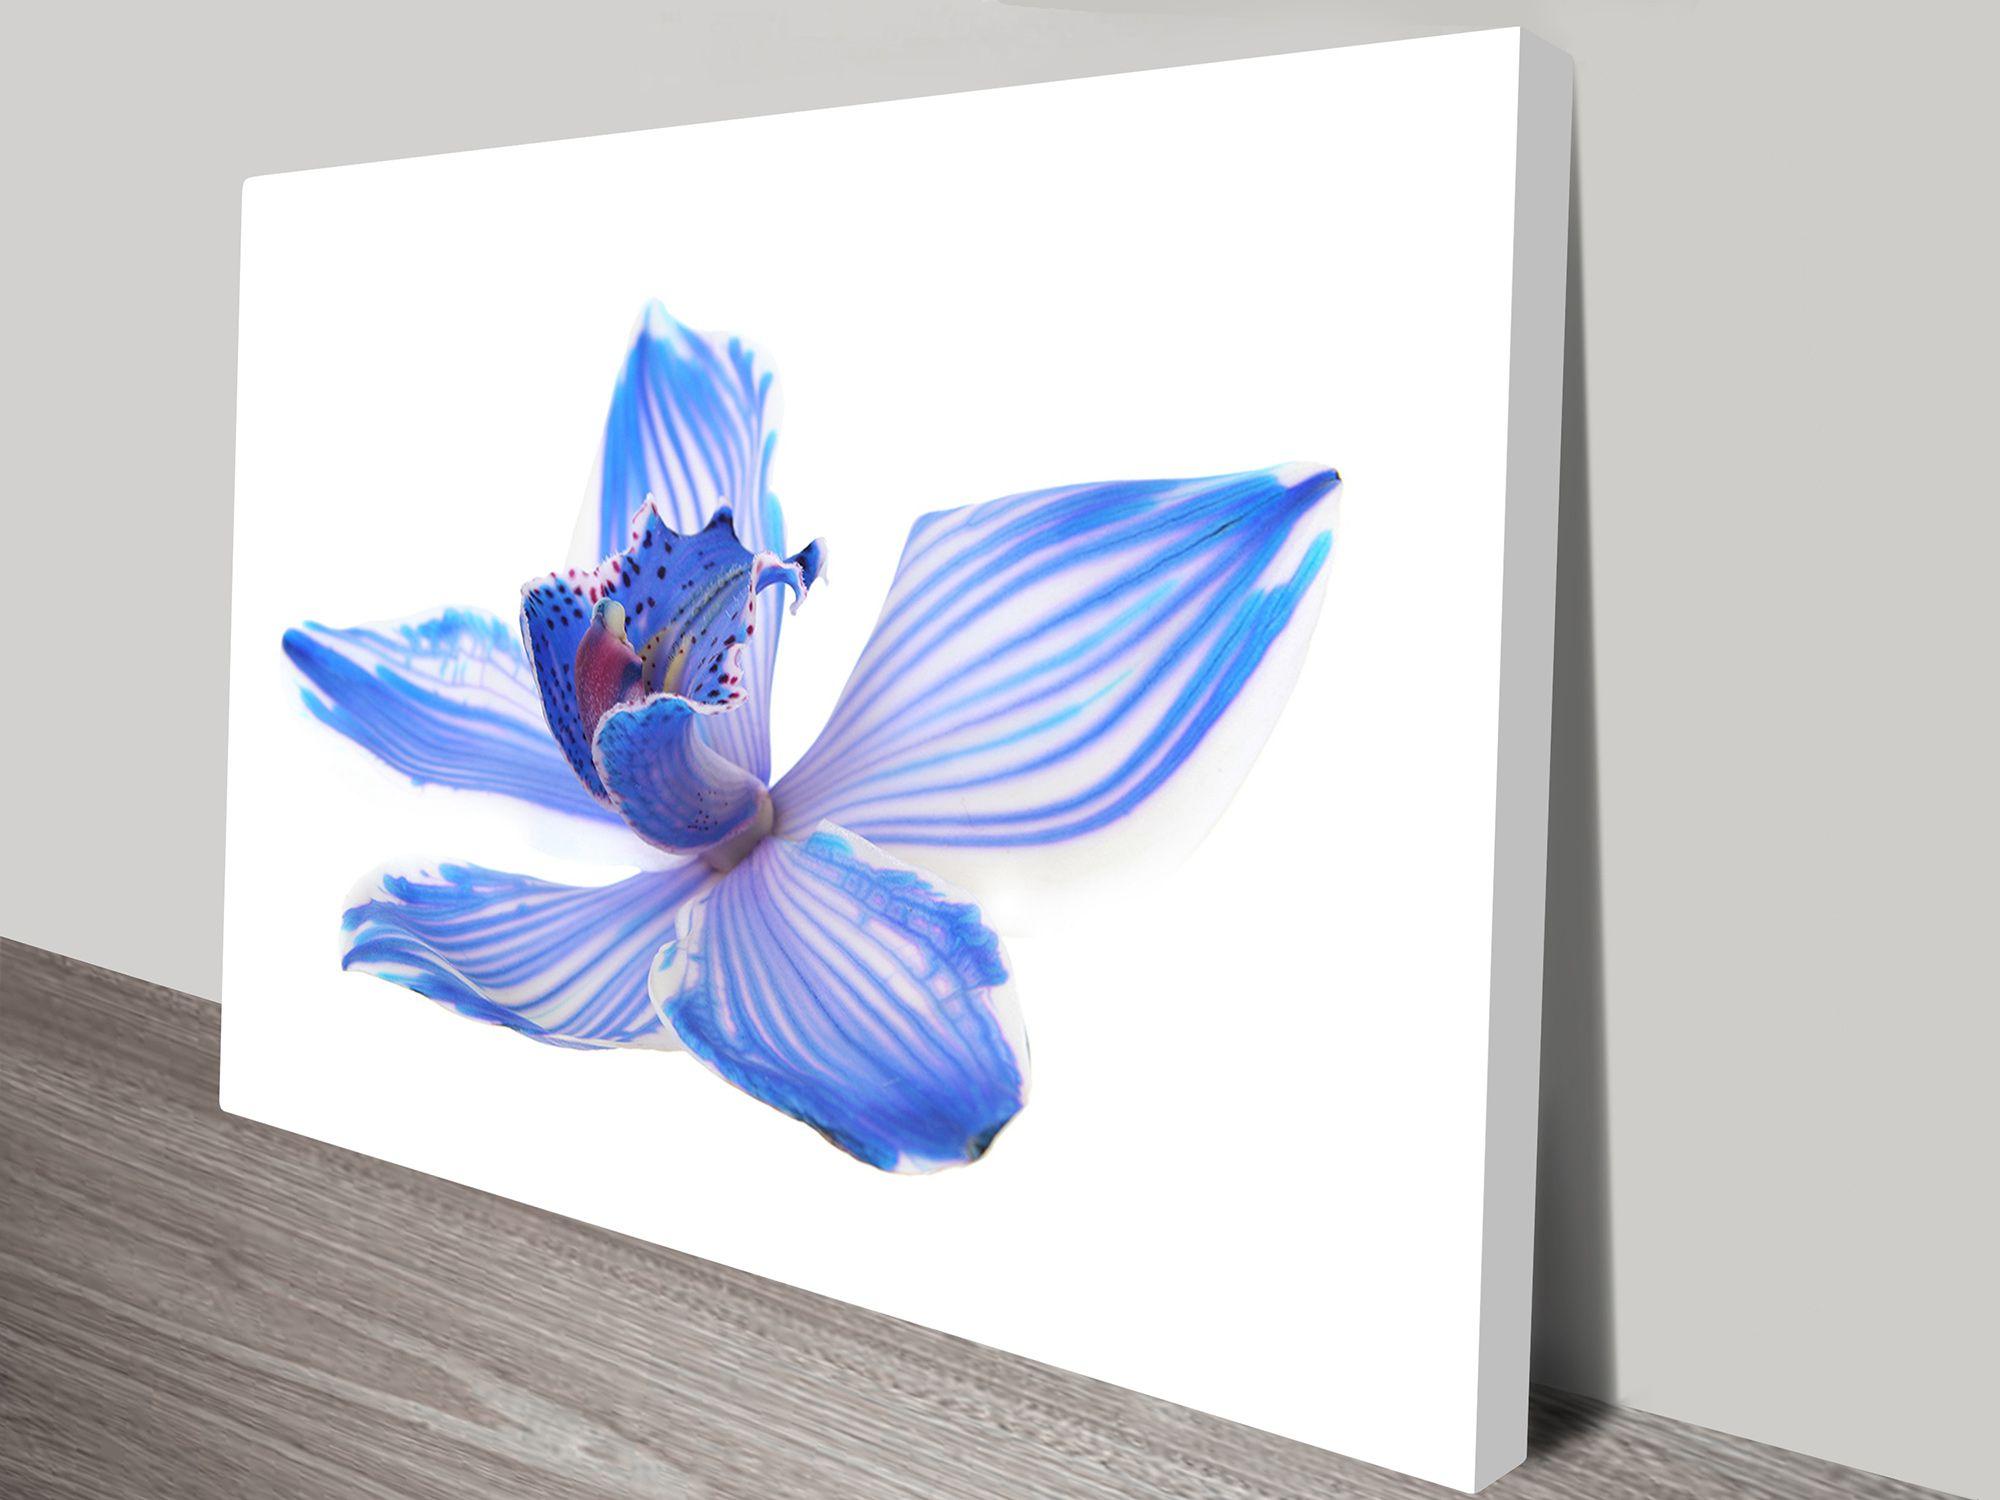 Blueorchid floralart canvasprints bluehorizonprints